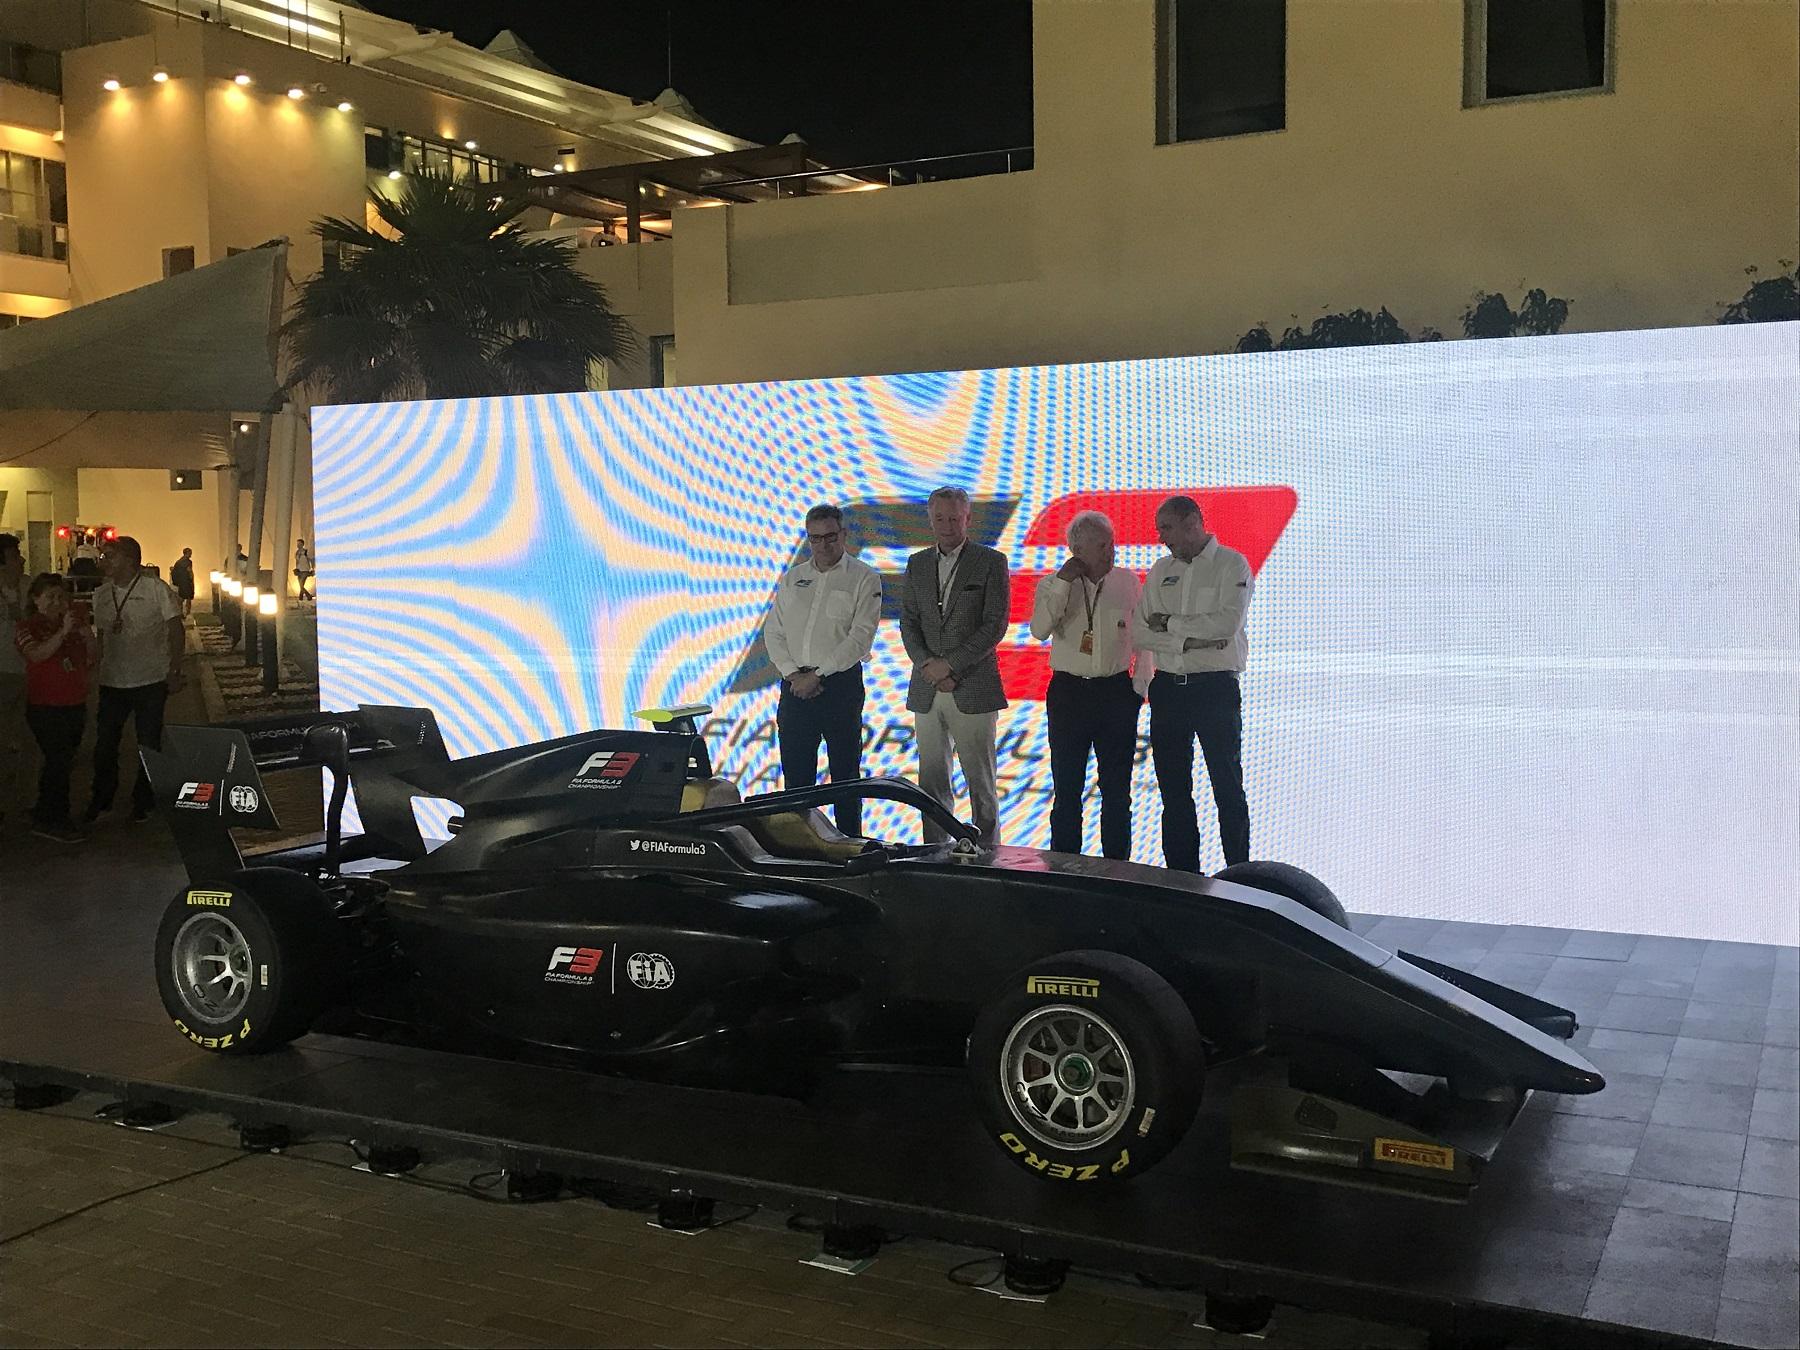 Презентация автомобиля международной Ф3